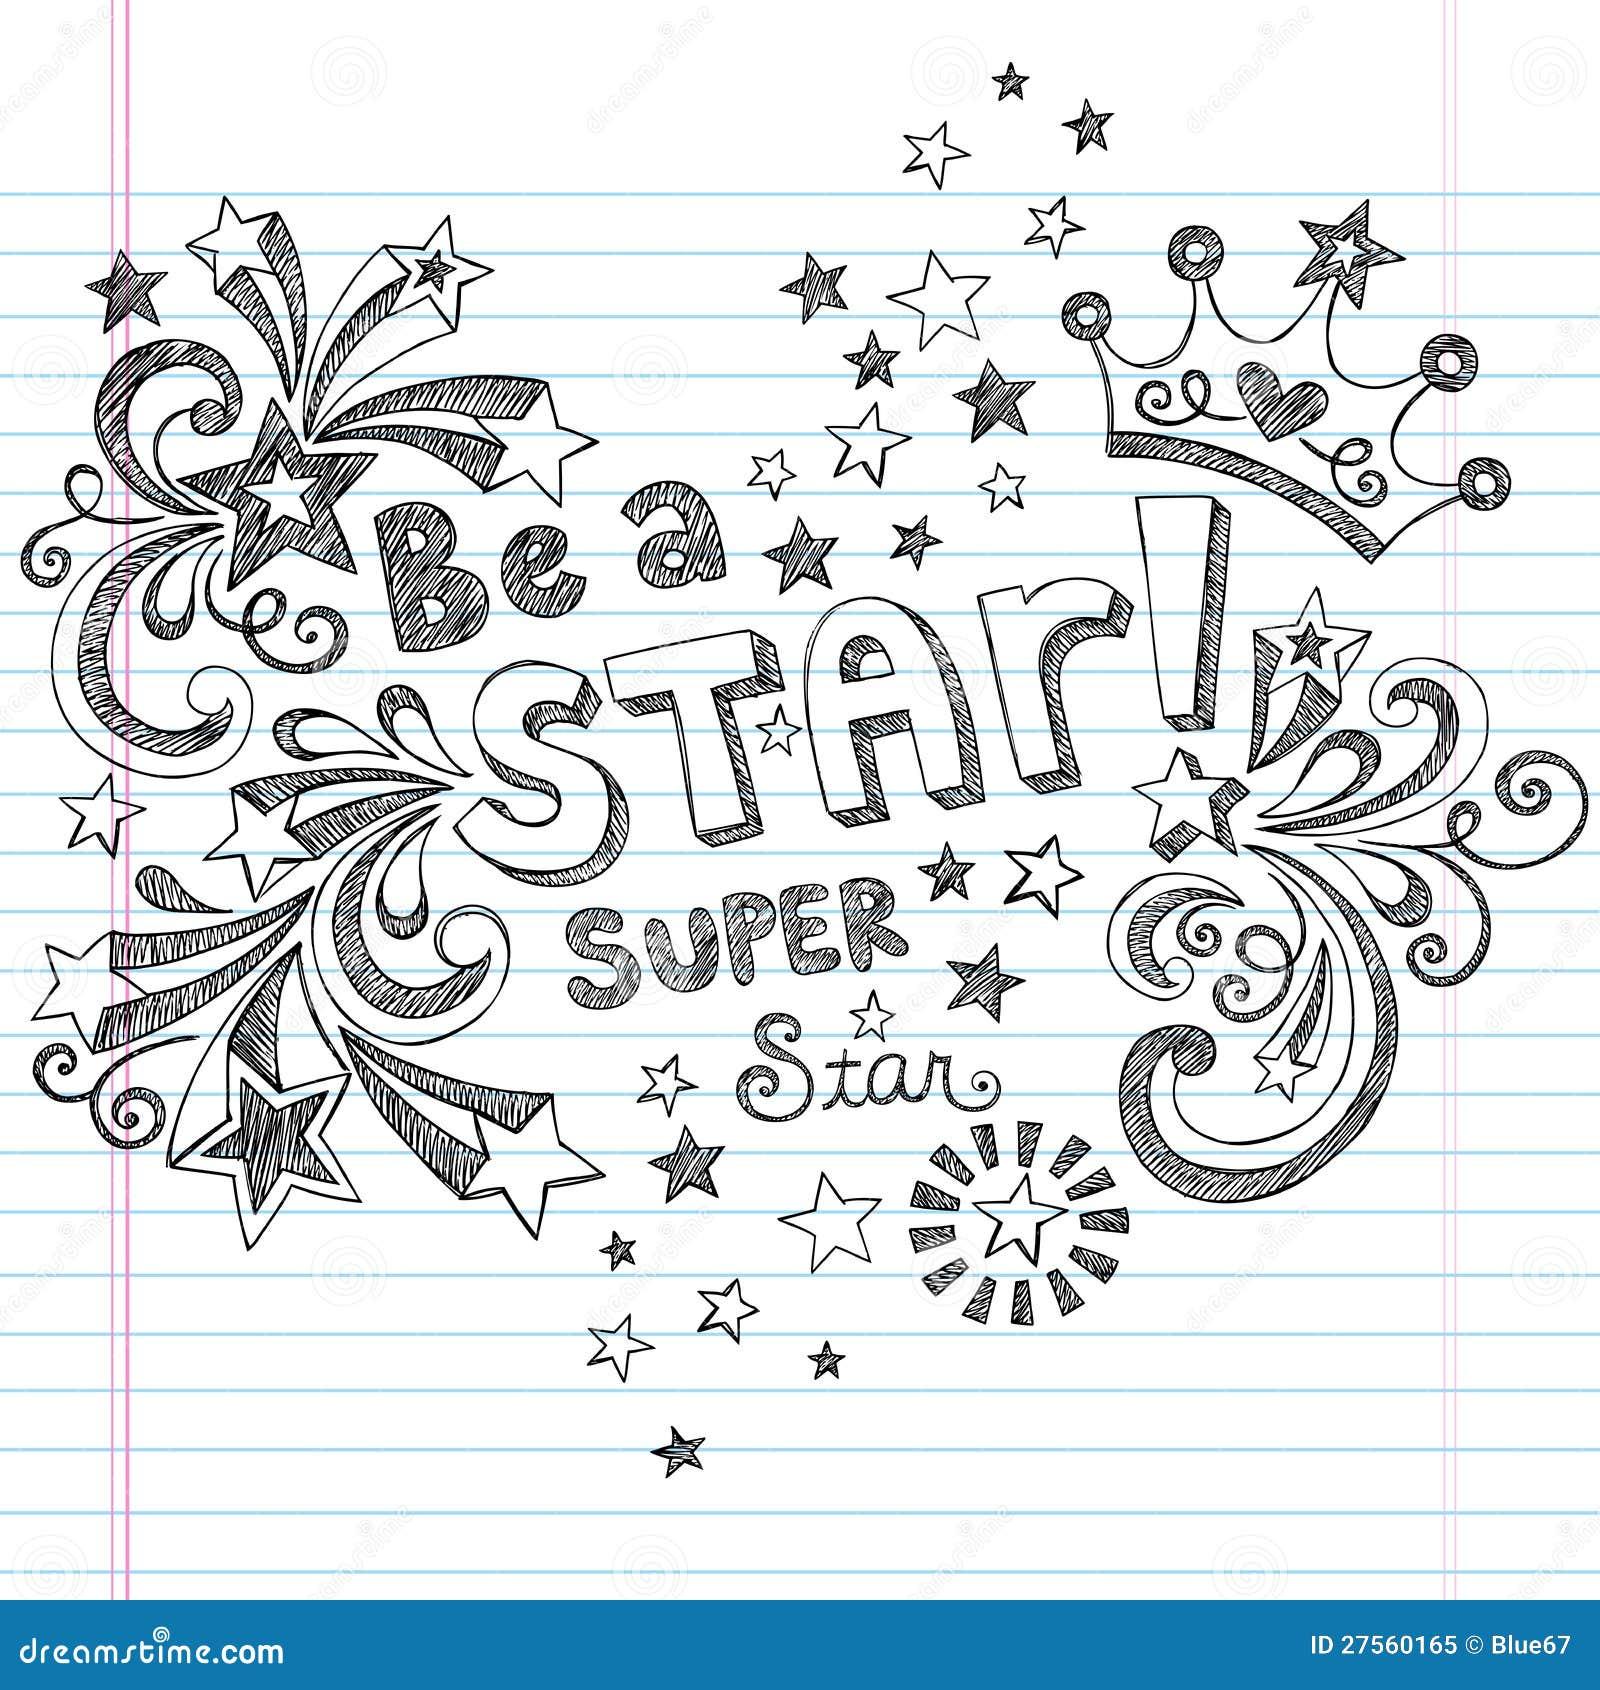 Be A Star Sketchy School Doodles Vector Design